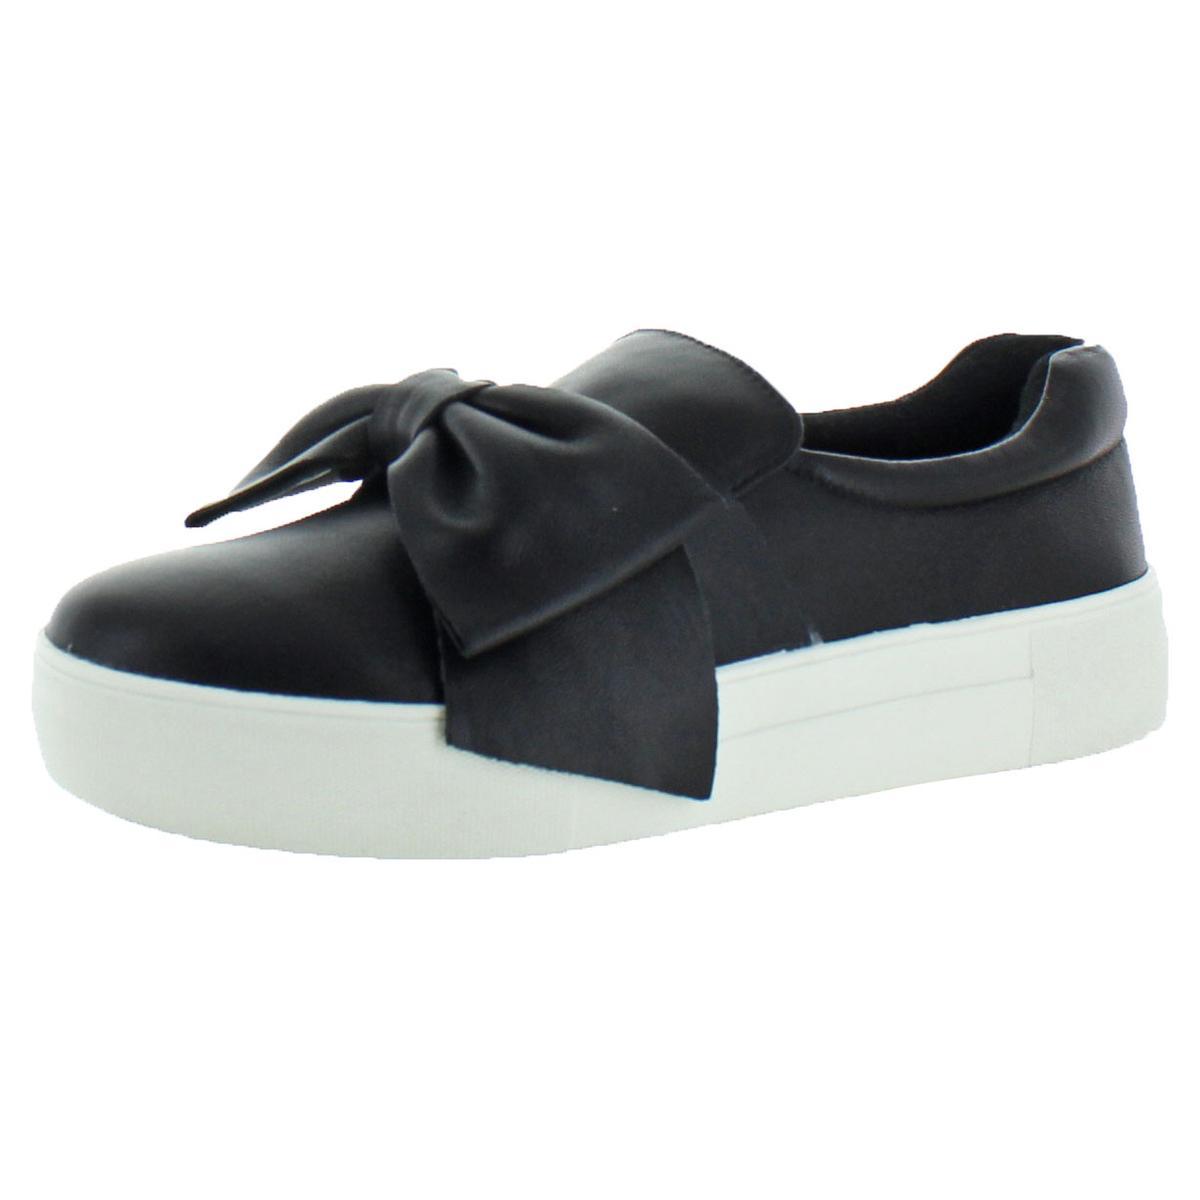 22fcb44c96c Details about Steve Madden Womens Empire Black Fashion Sneakers 7.5 Medium  (B